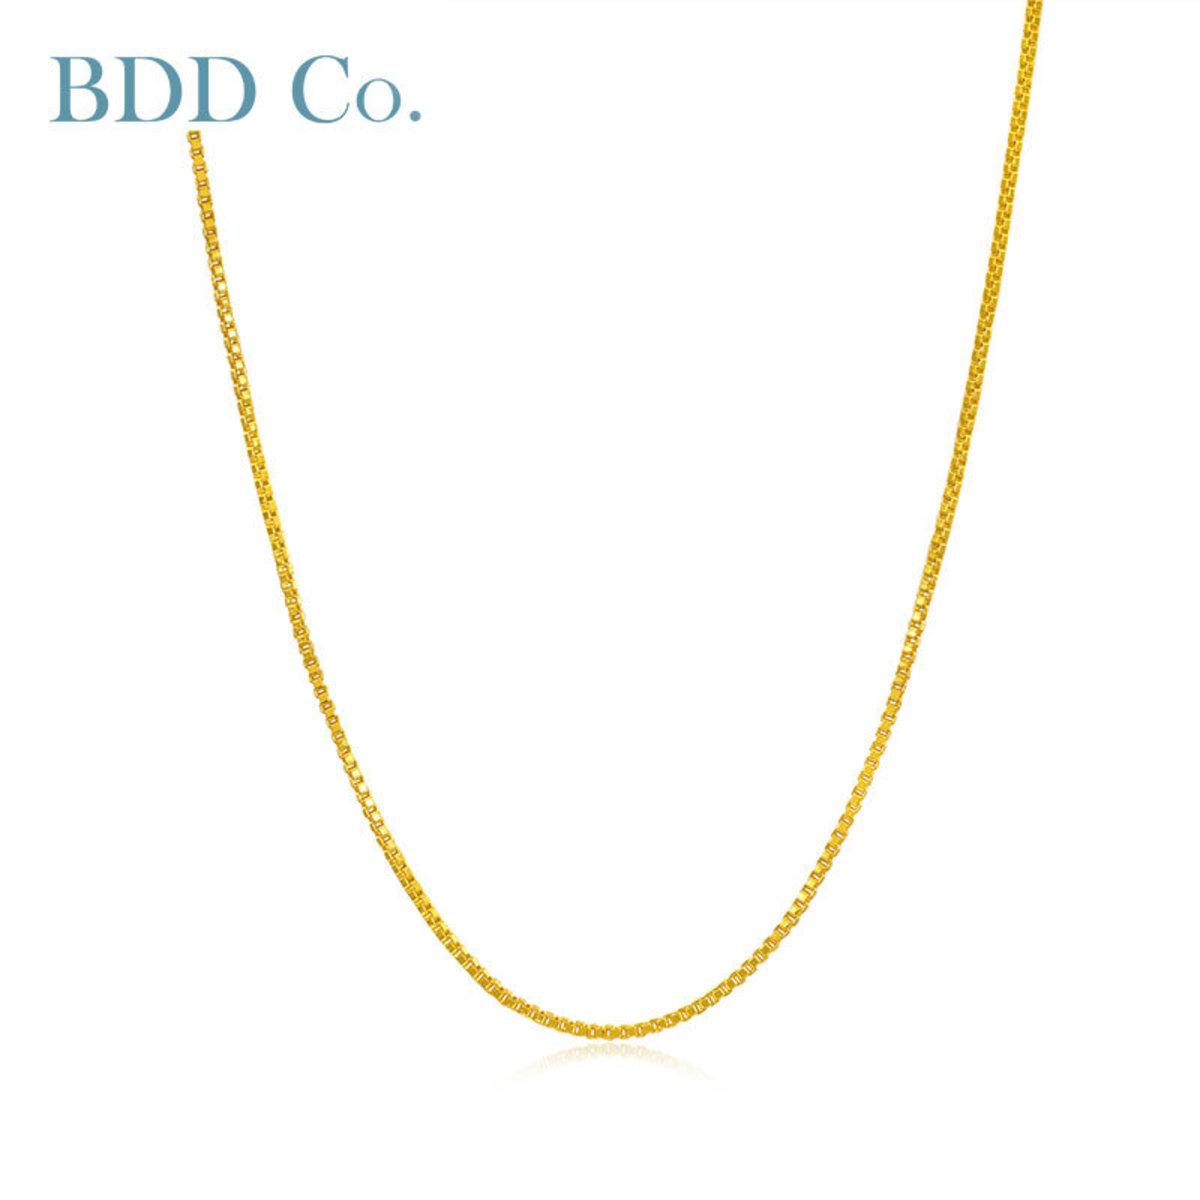 【BDD-Co.】黃金項鏈 足金素鏈 盒子鏈45cm